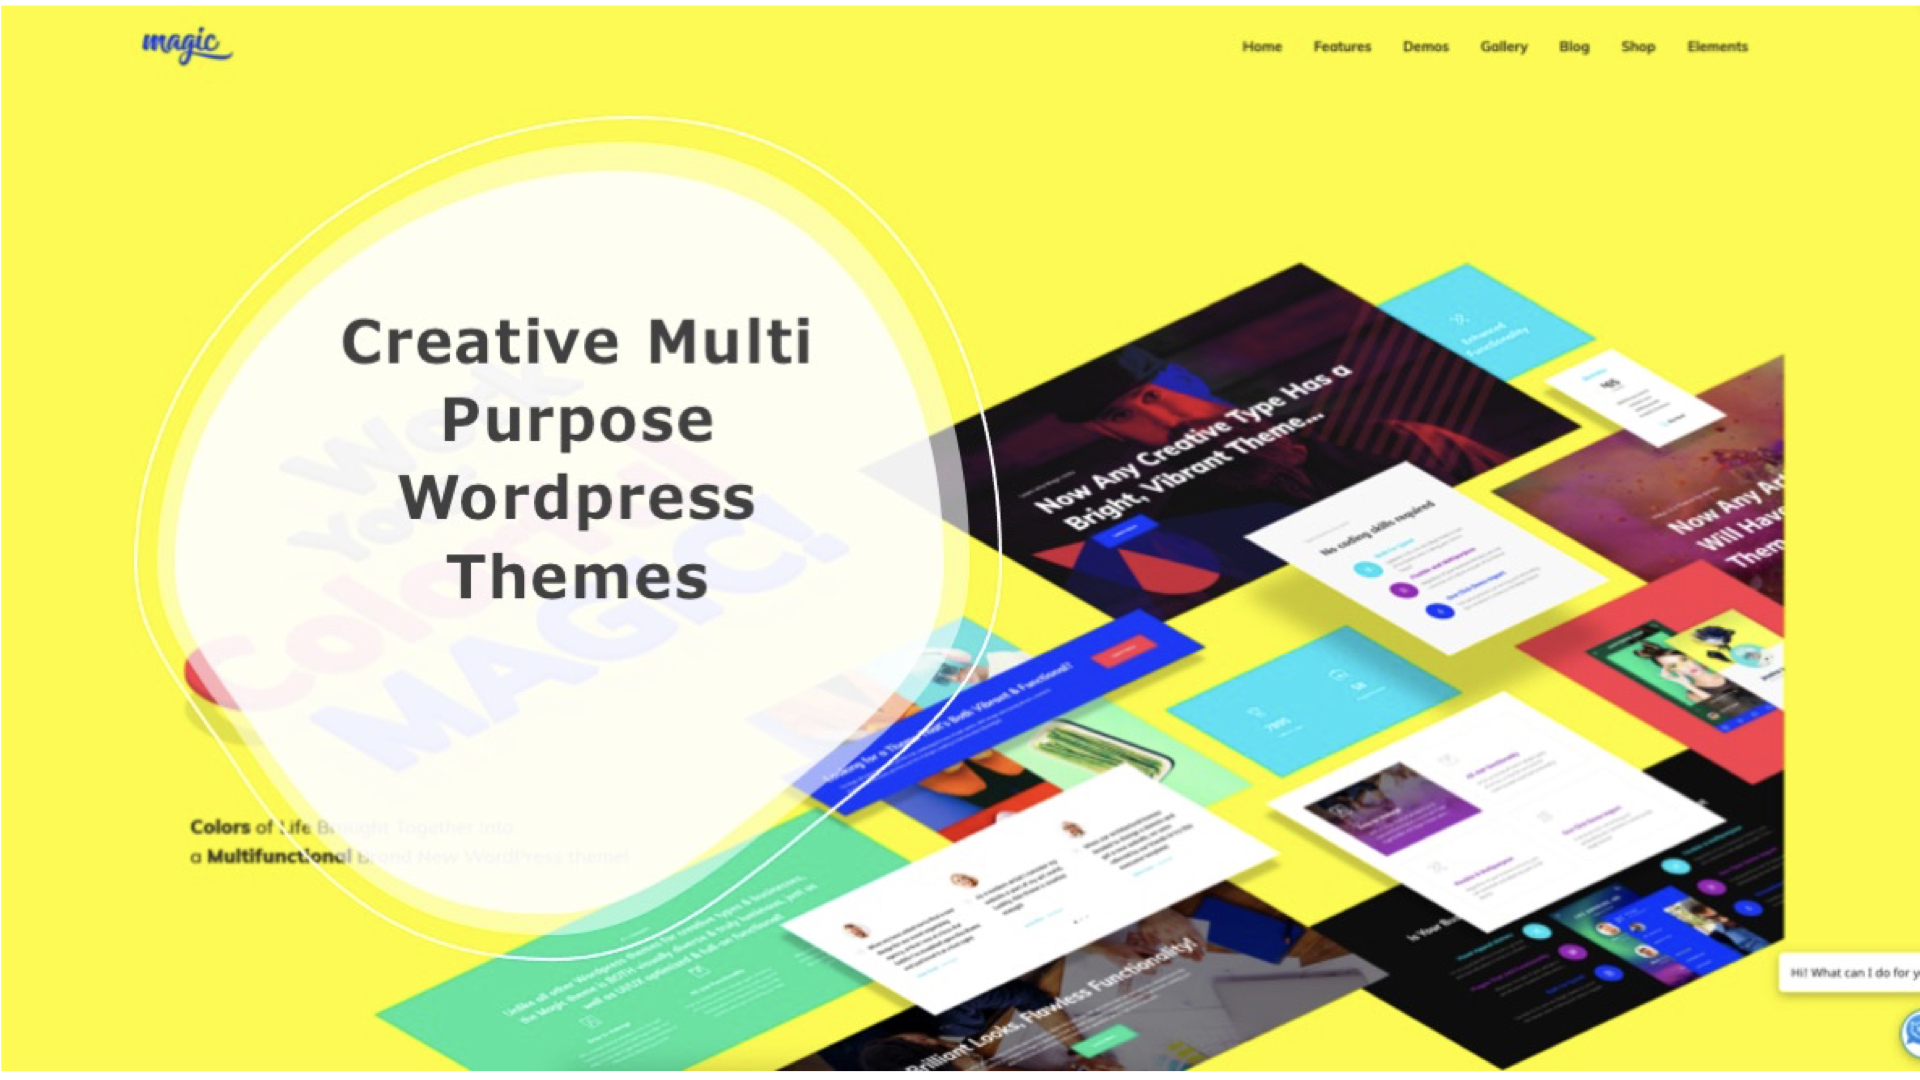 Creative Multi Purpose Wordpress Themes